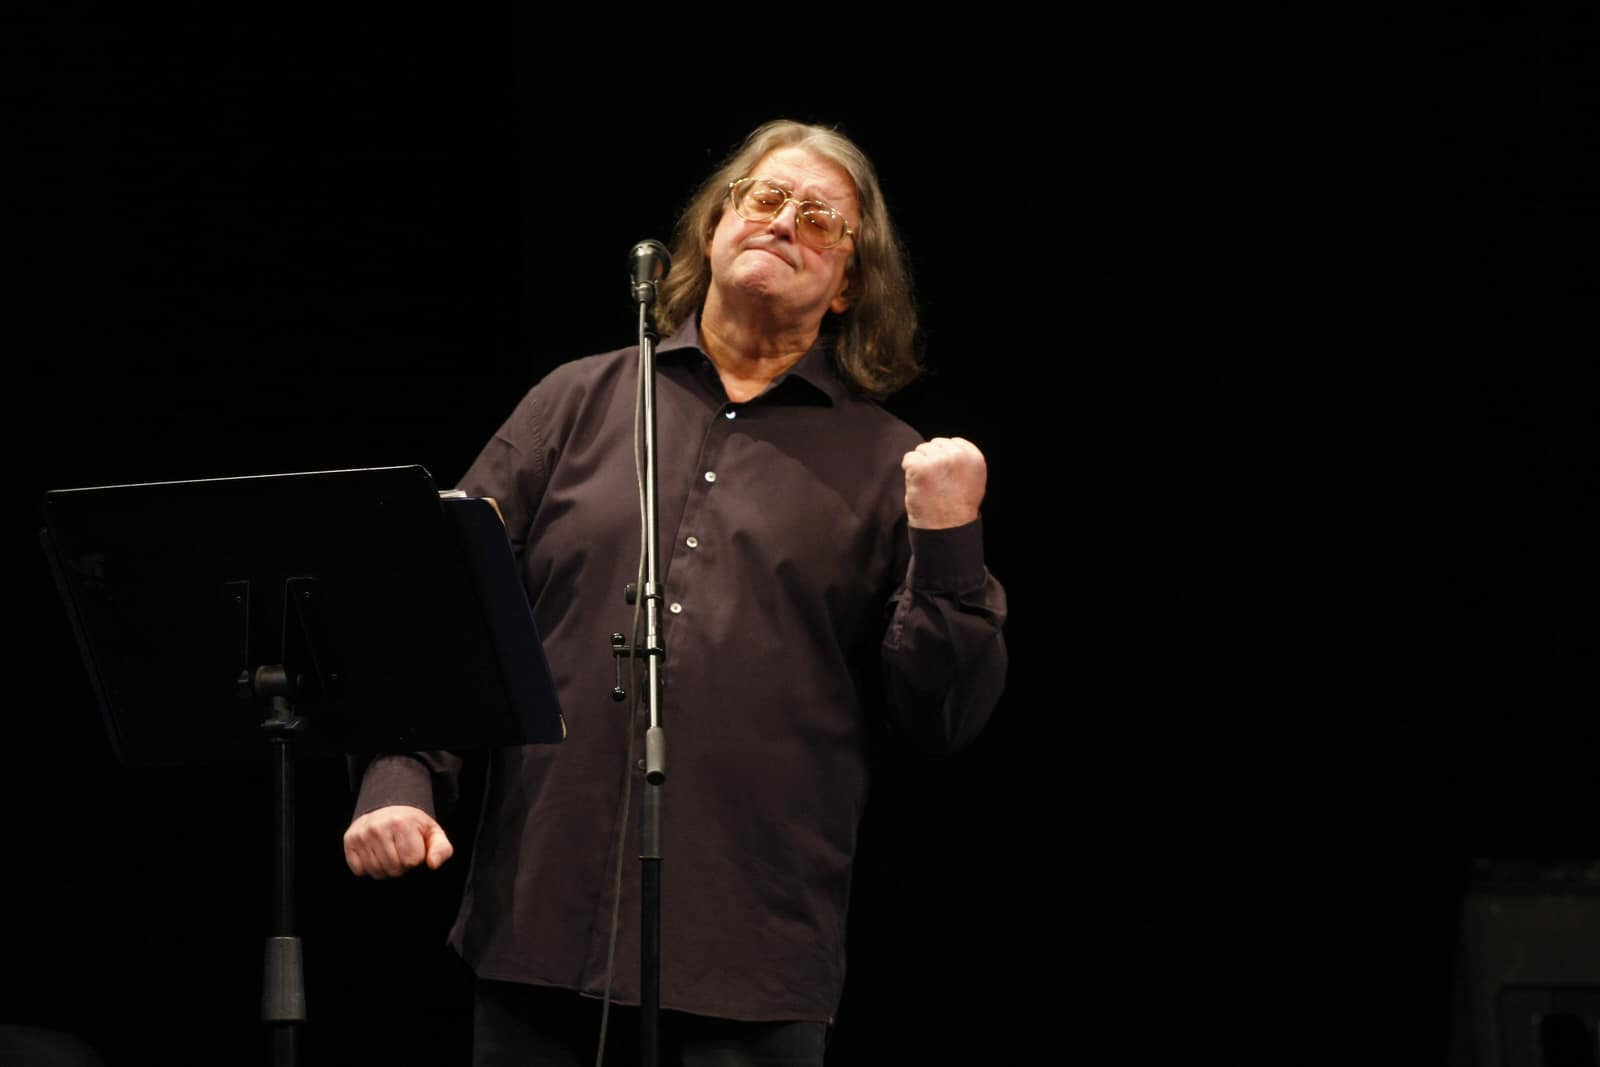 Концерт Александра Градского в Москве